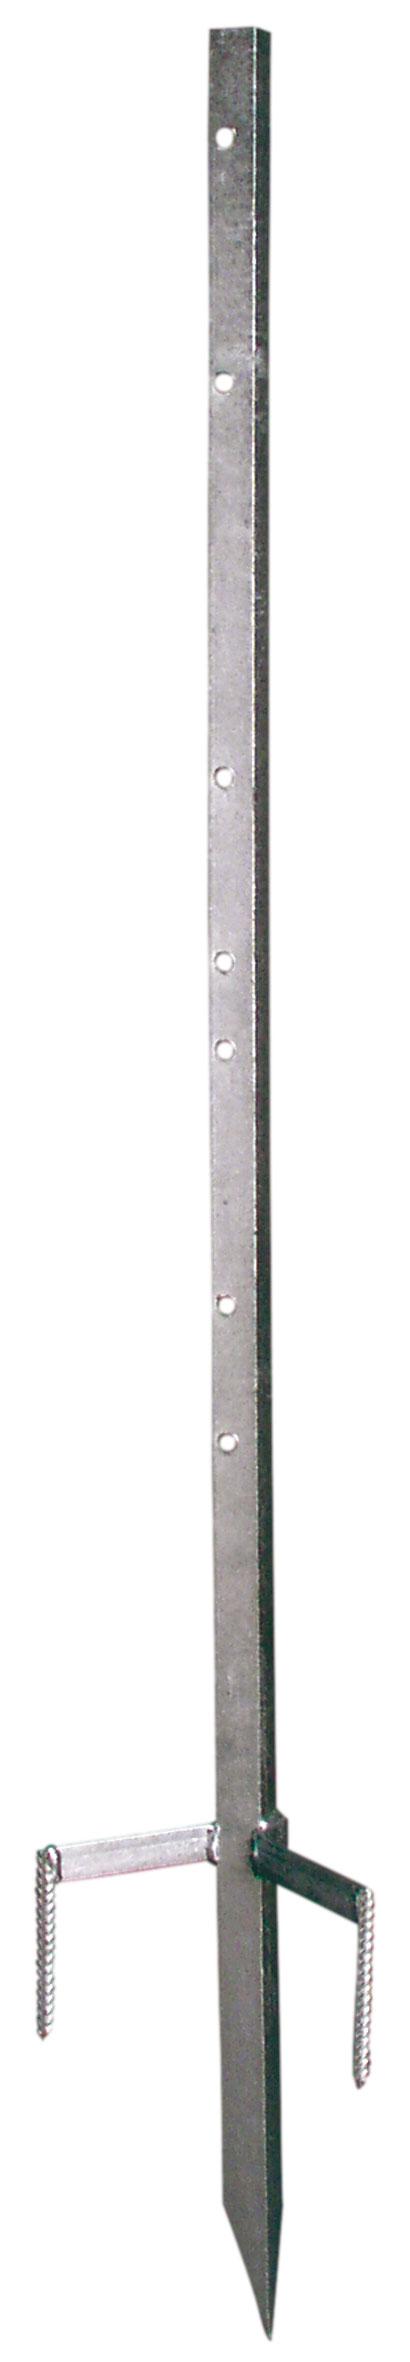 Eckpfahl WZ 85